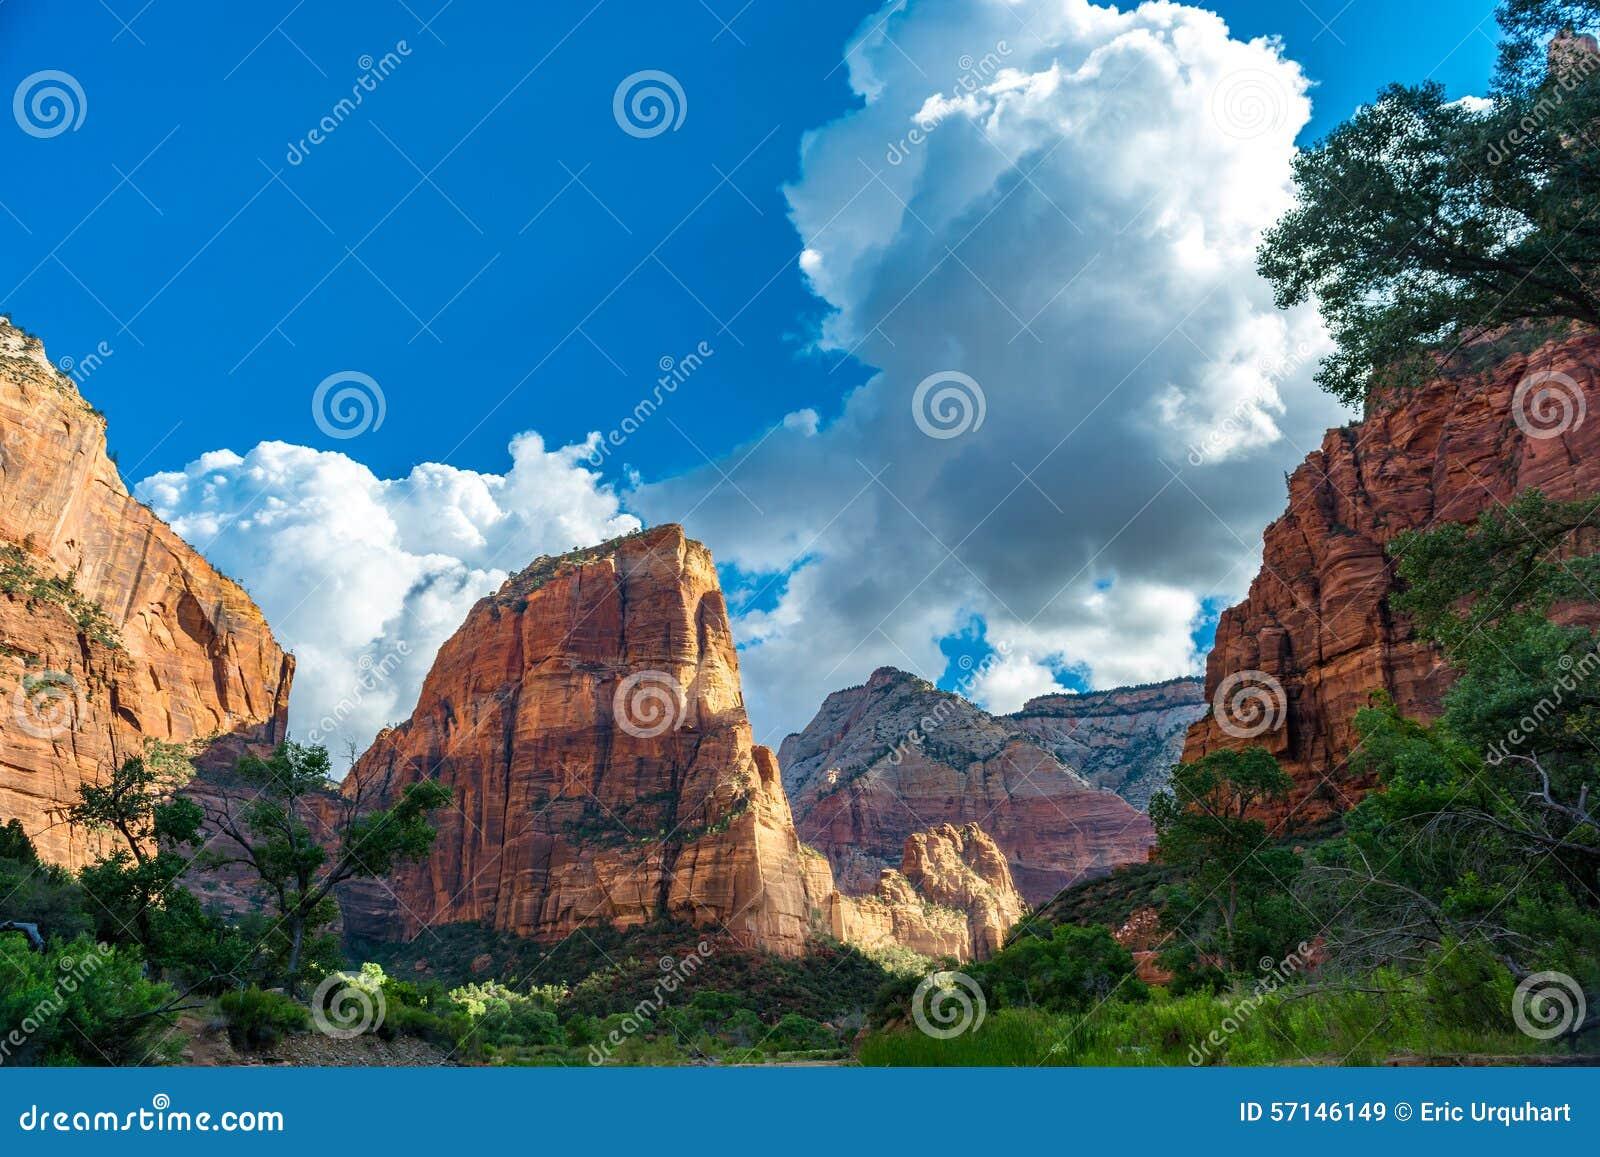 Zion_Canyon_Angels_Landing